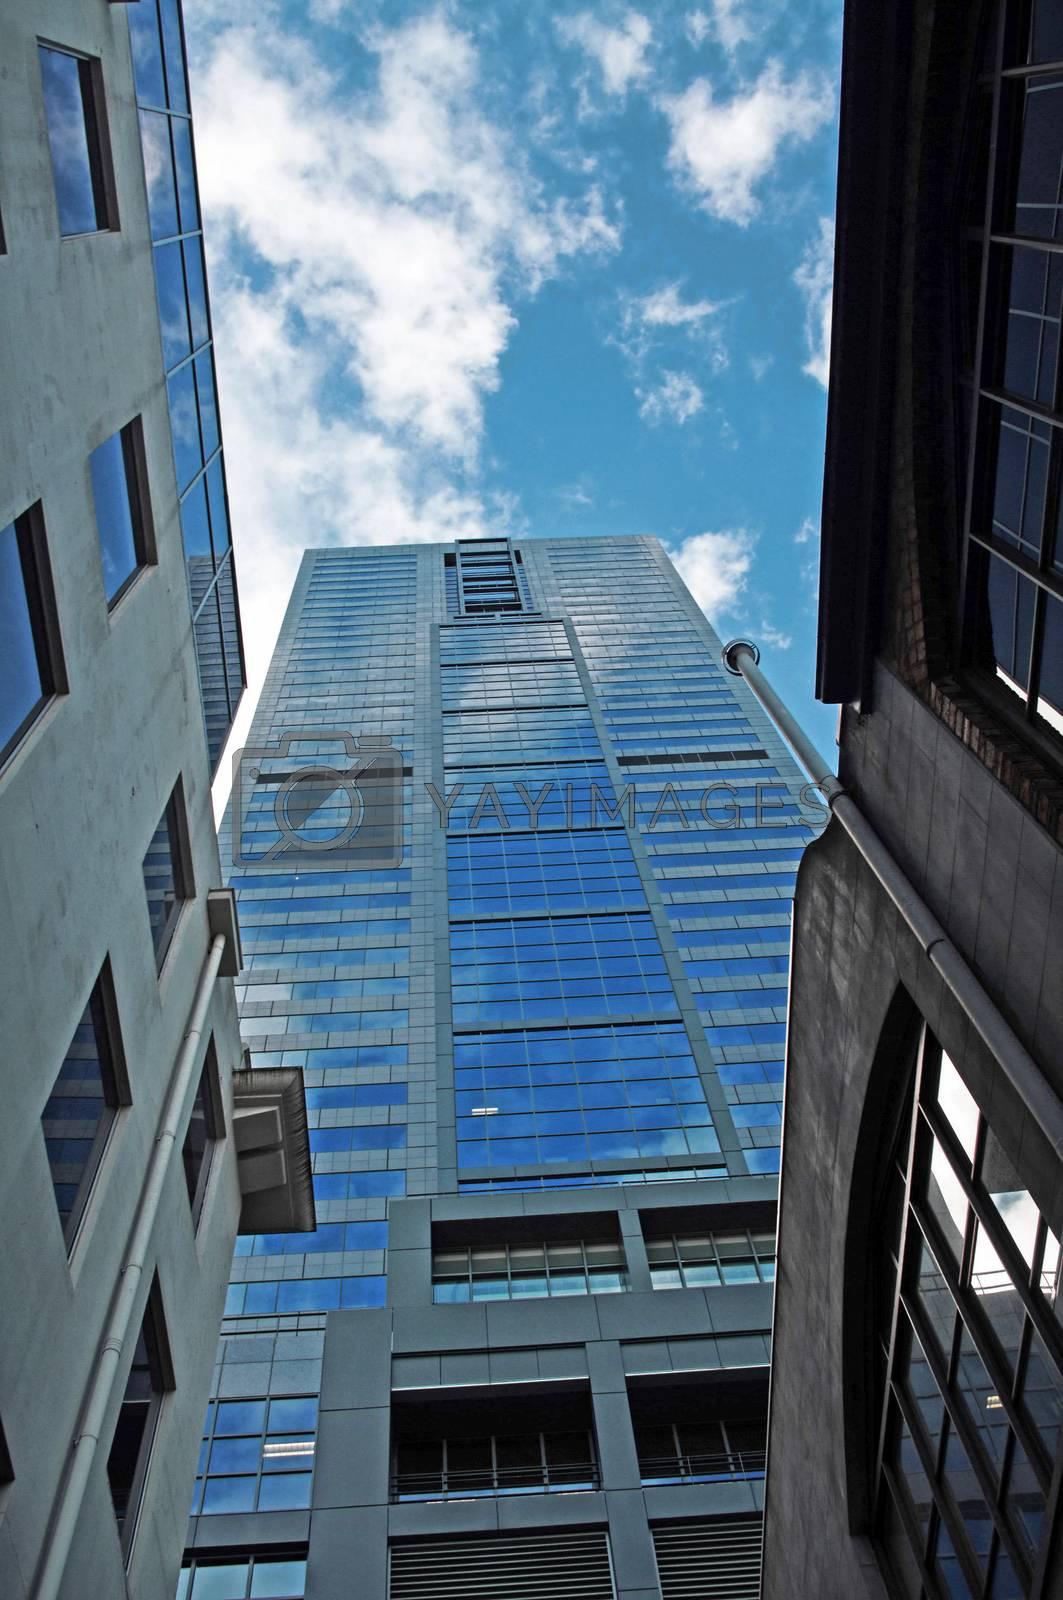 Hdr shot of skyscraper in Melbourne